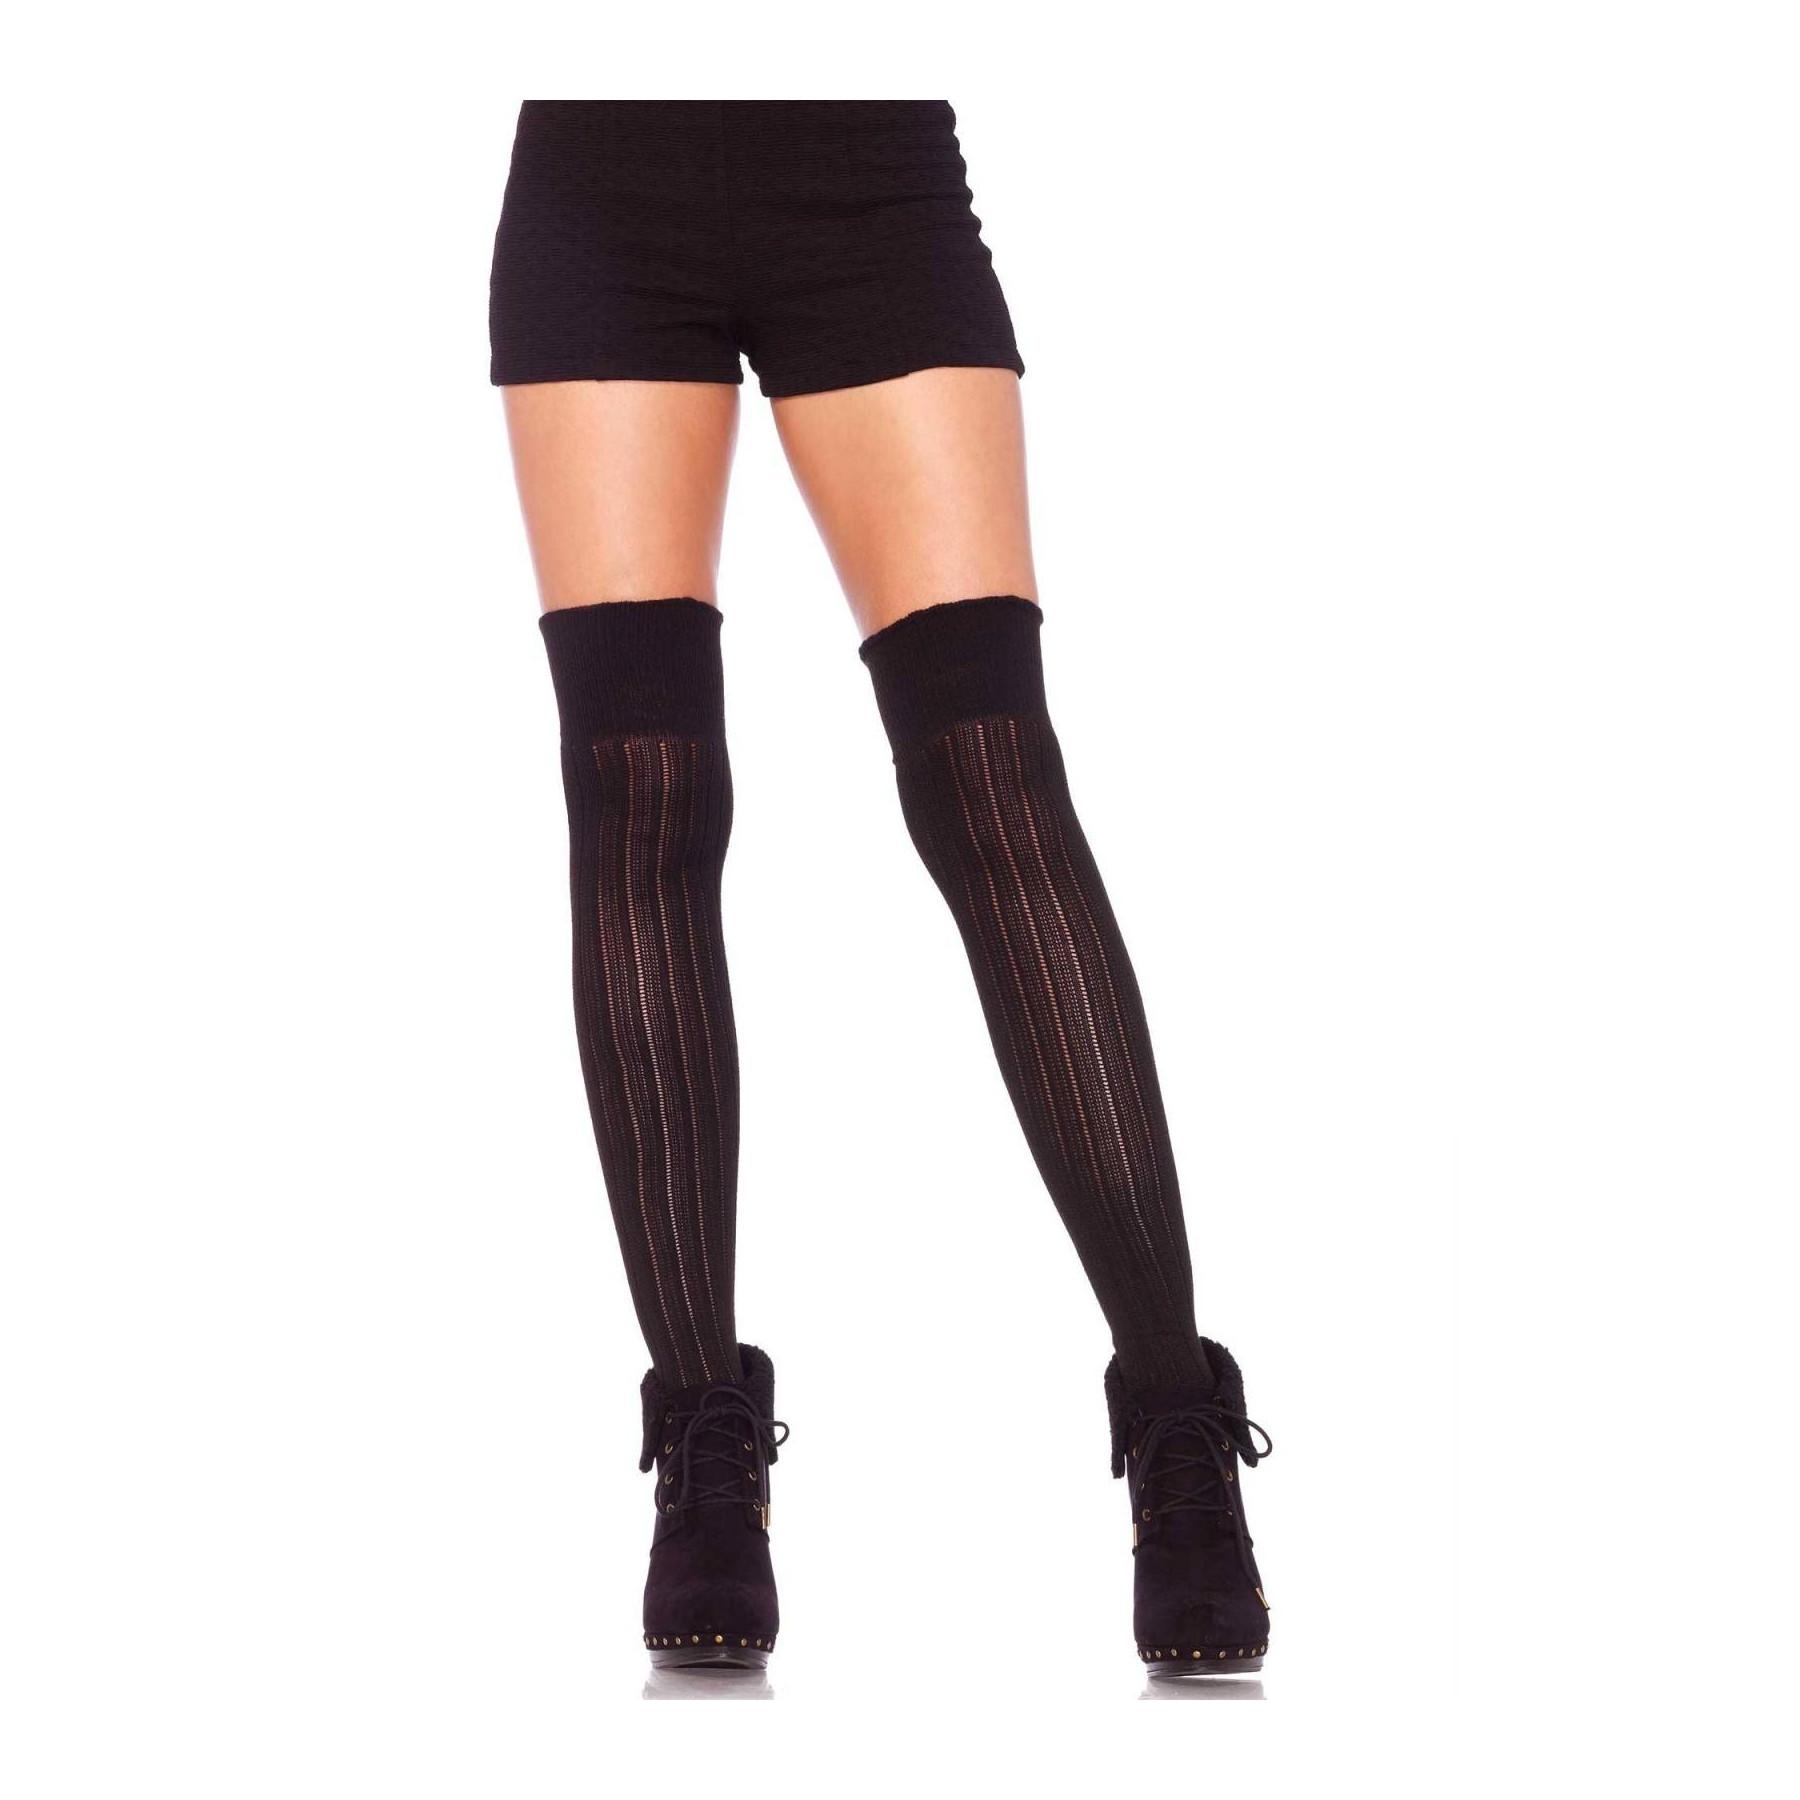 Parigine traforate calze nere sopra al ginocchio Leg Avenue